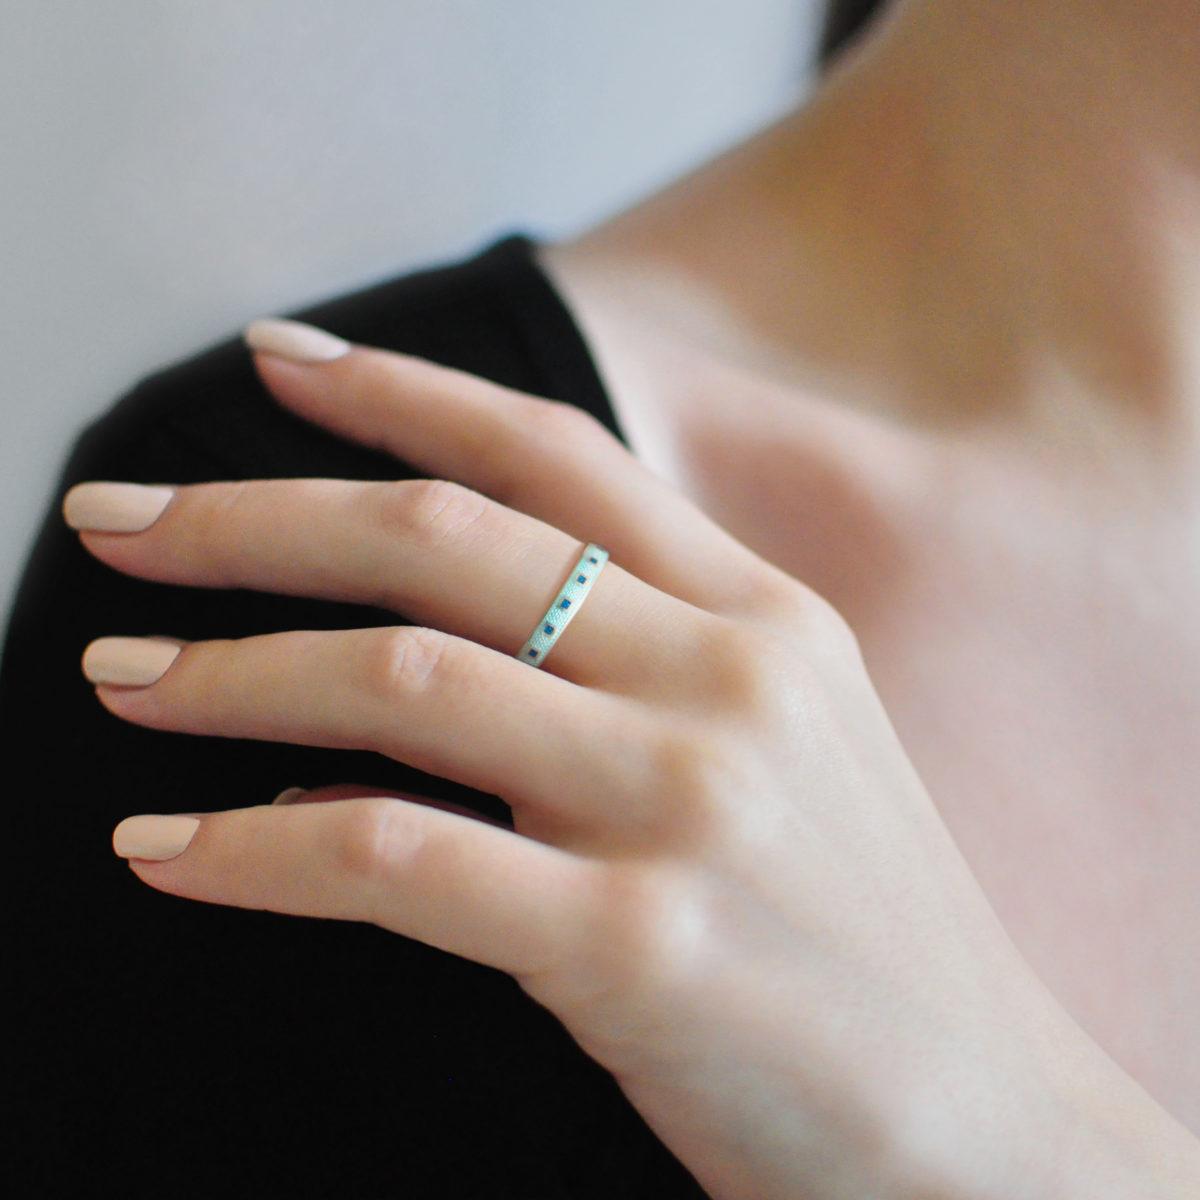 Serebro golubaya 10 1200x1200 - Кольцо из серебра «Седмица», голубое